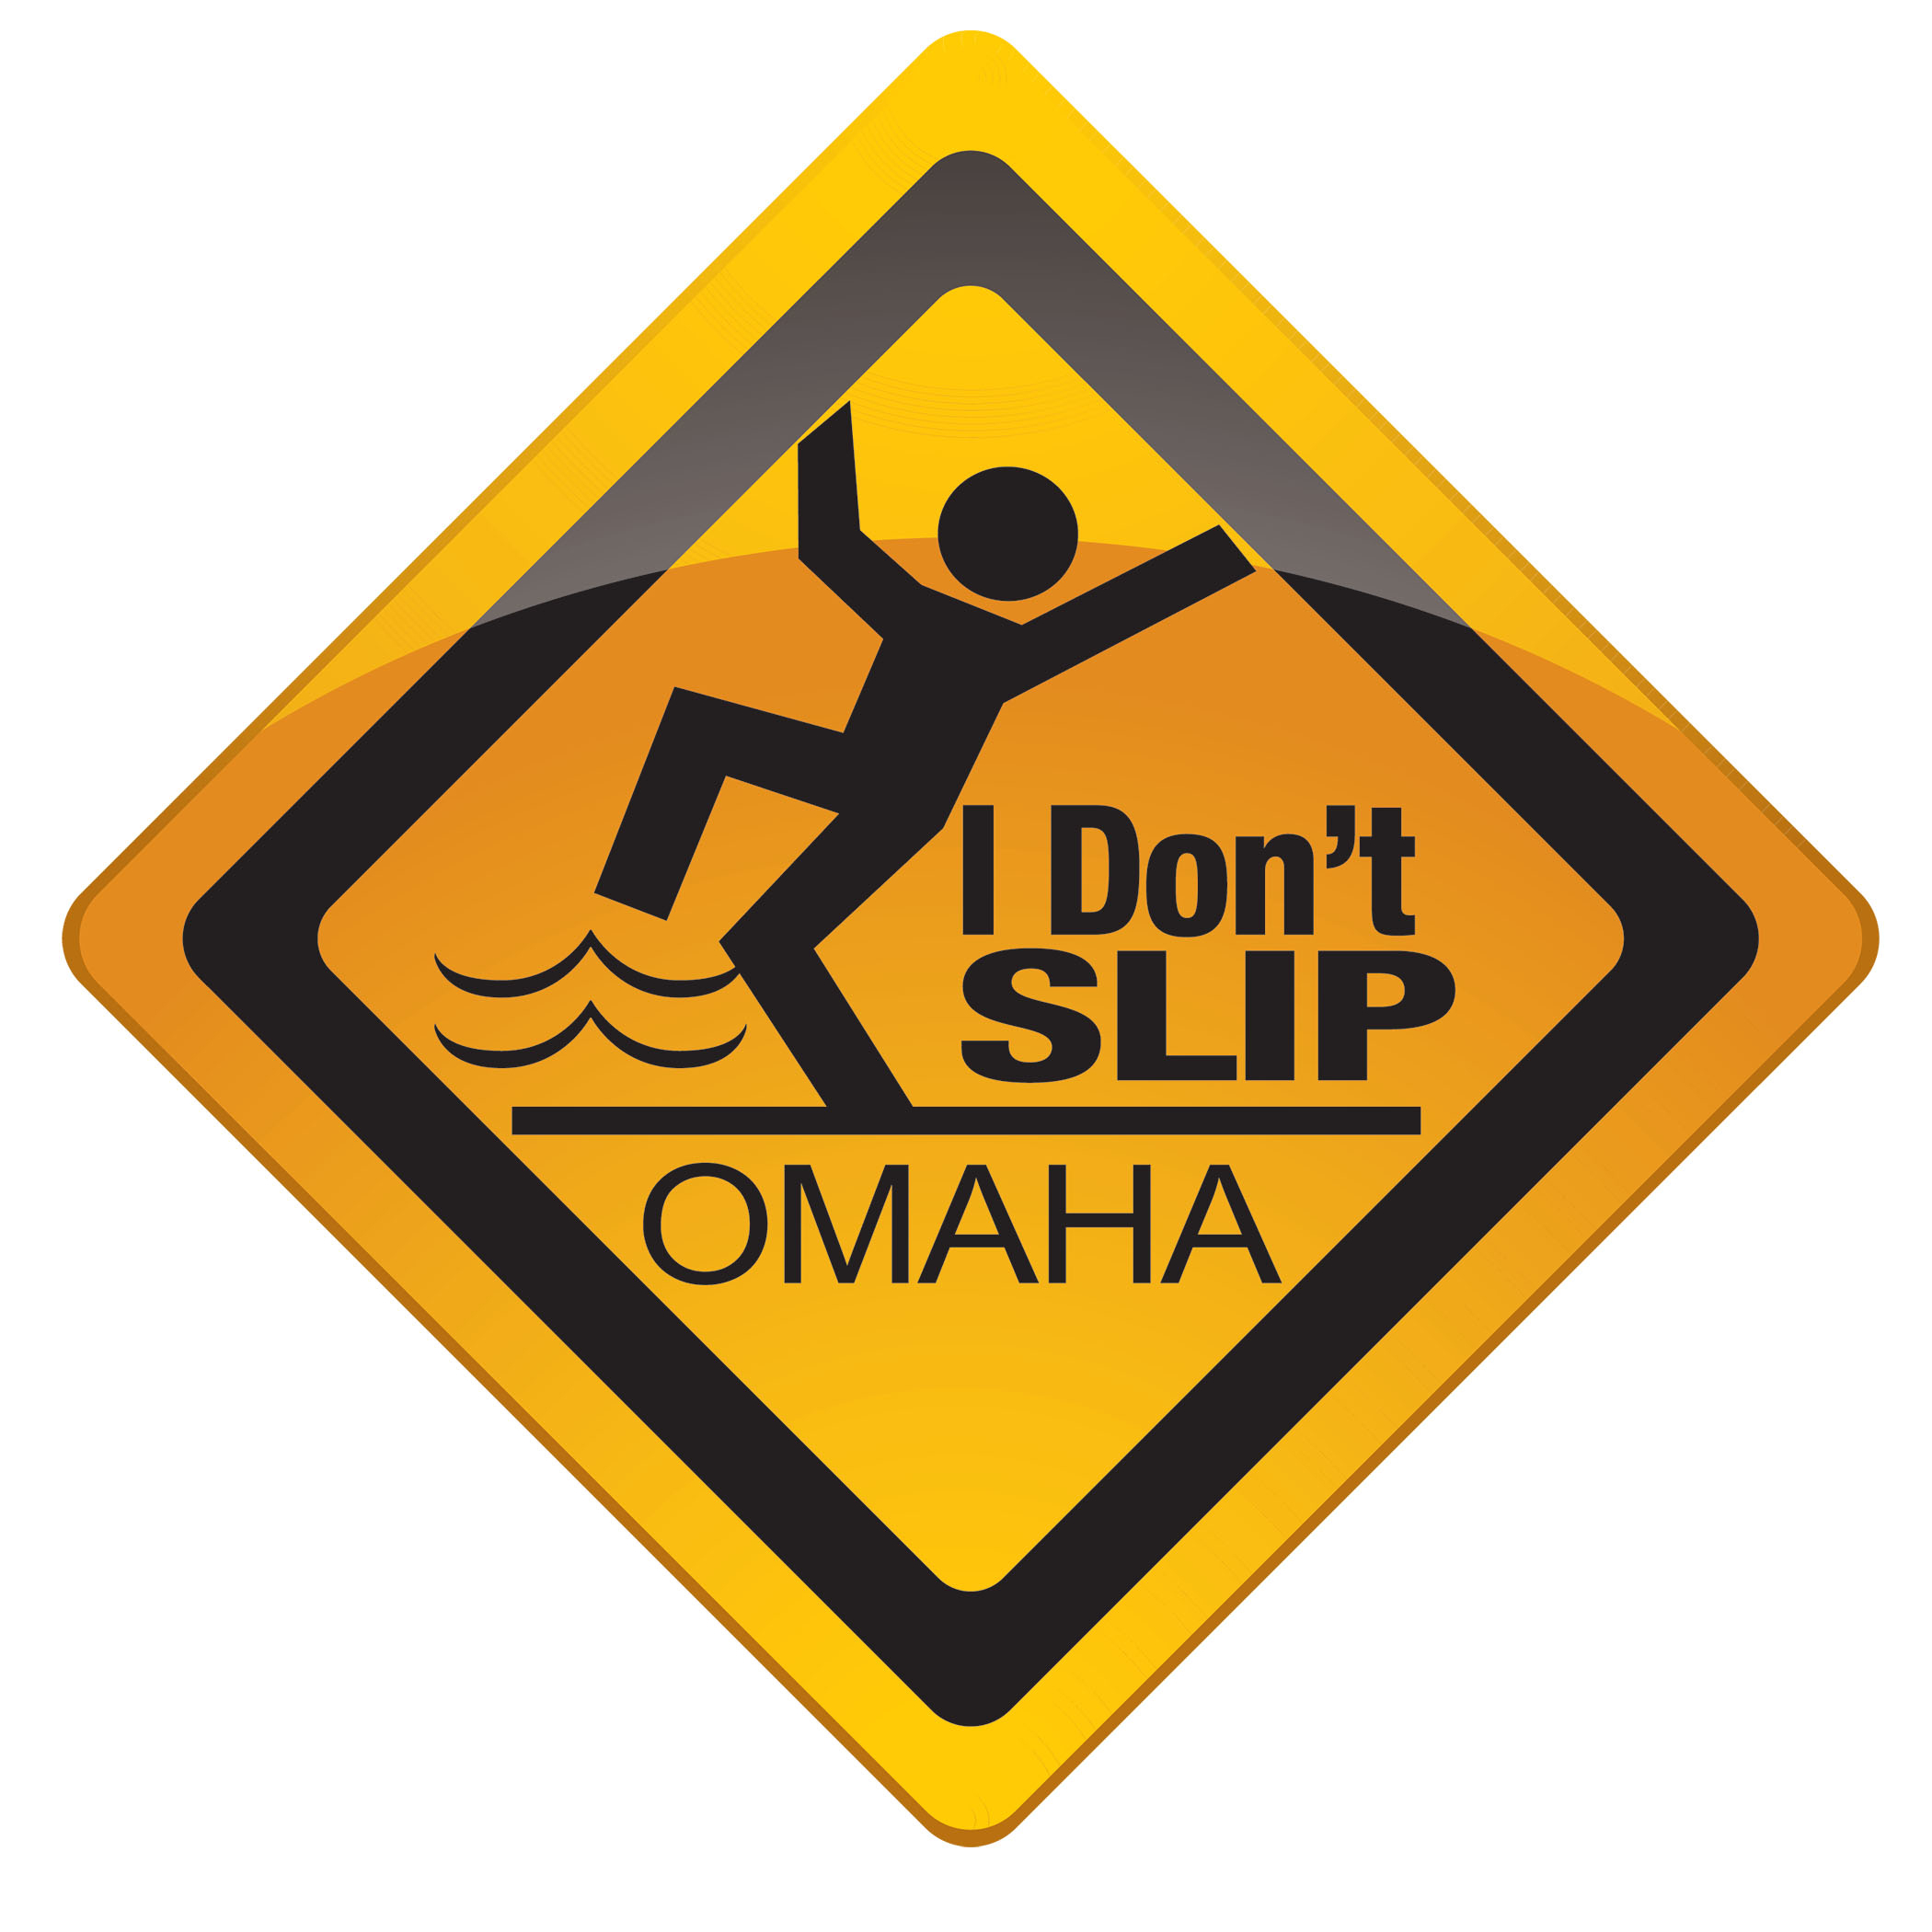 I Don't Slip Omaha image 14